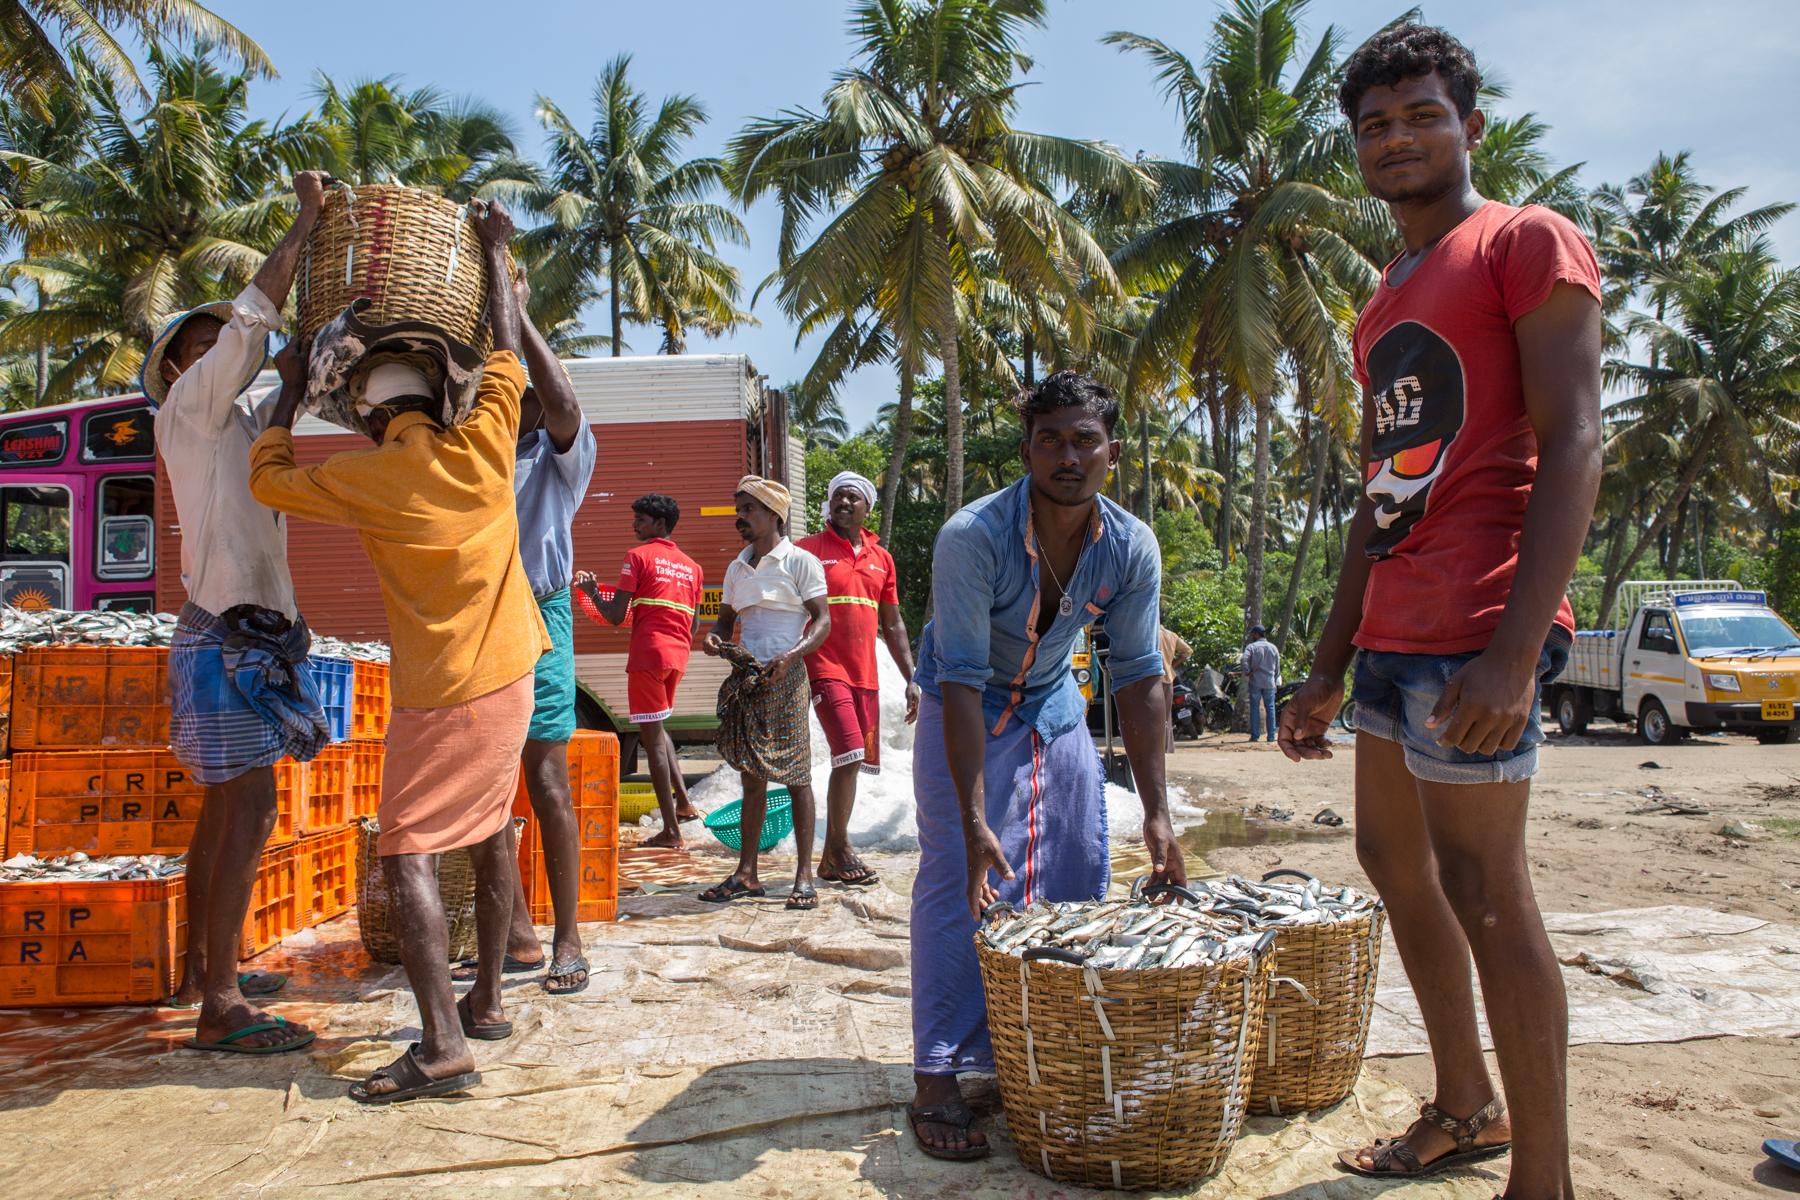 Pecheurs-alleppey-inde-kerala-cochin